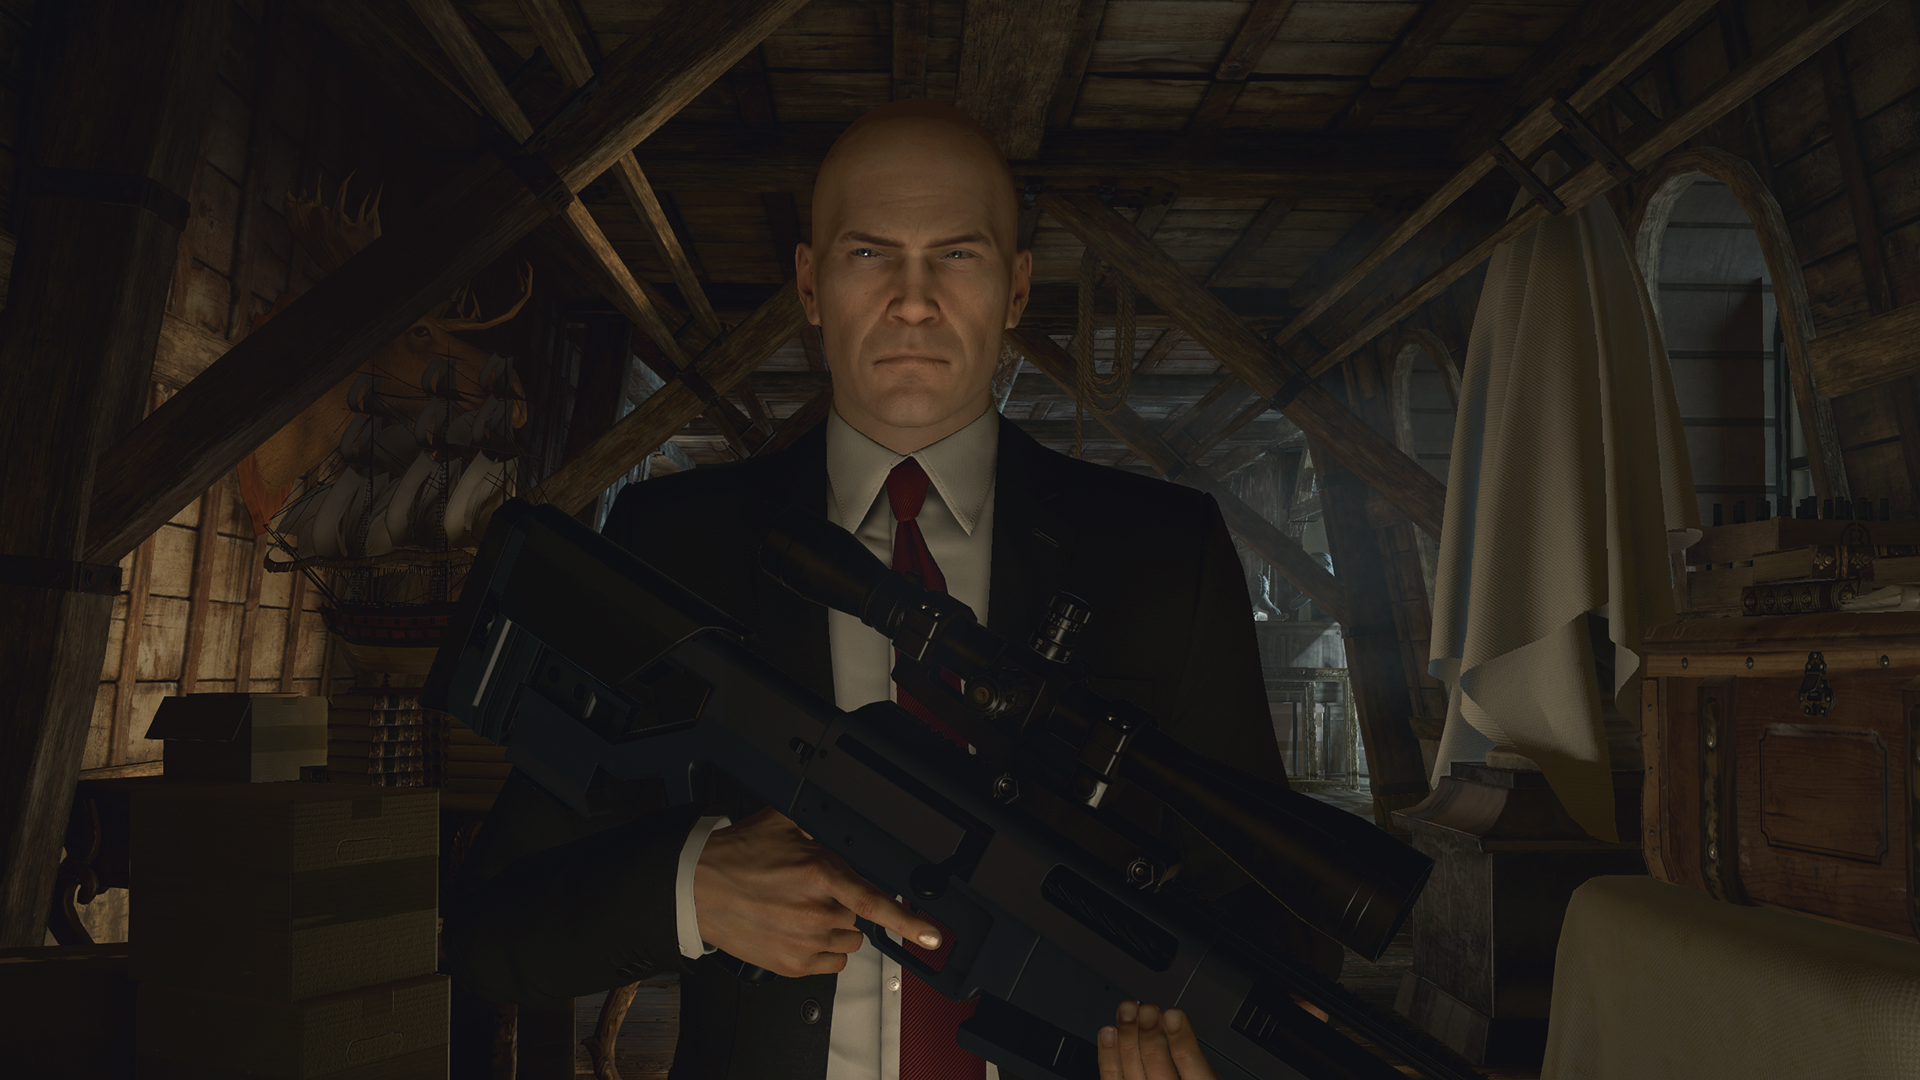 hitman 2016 video game gameplay